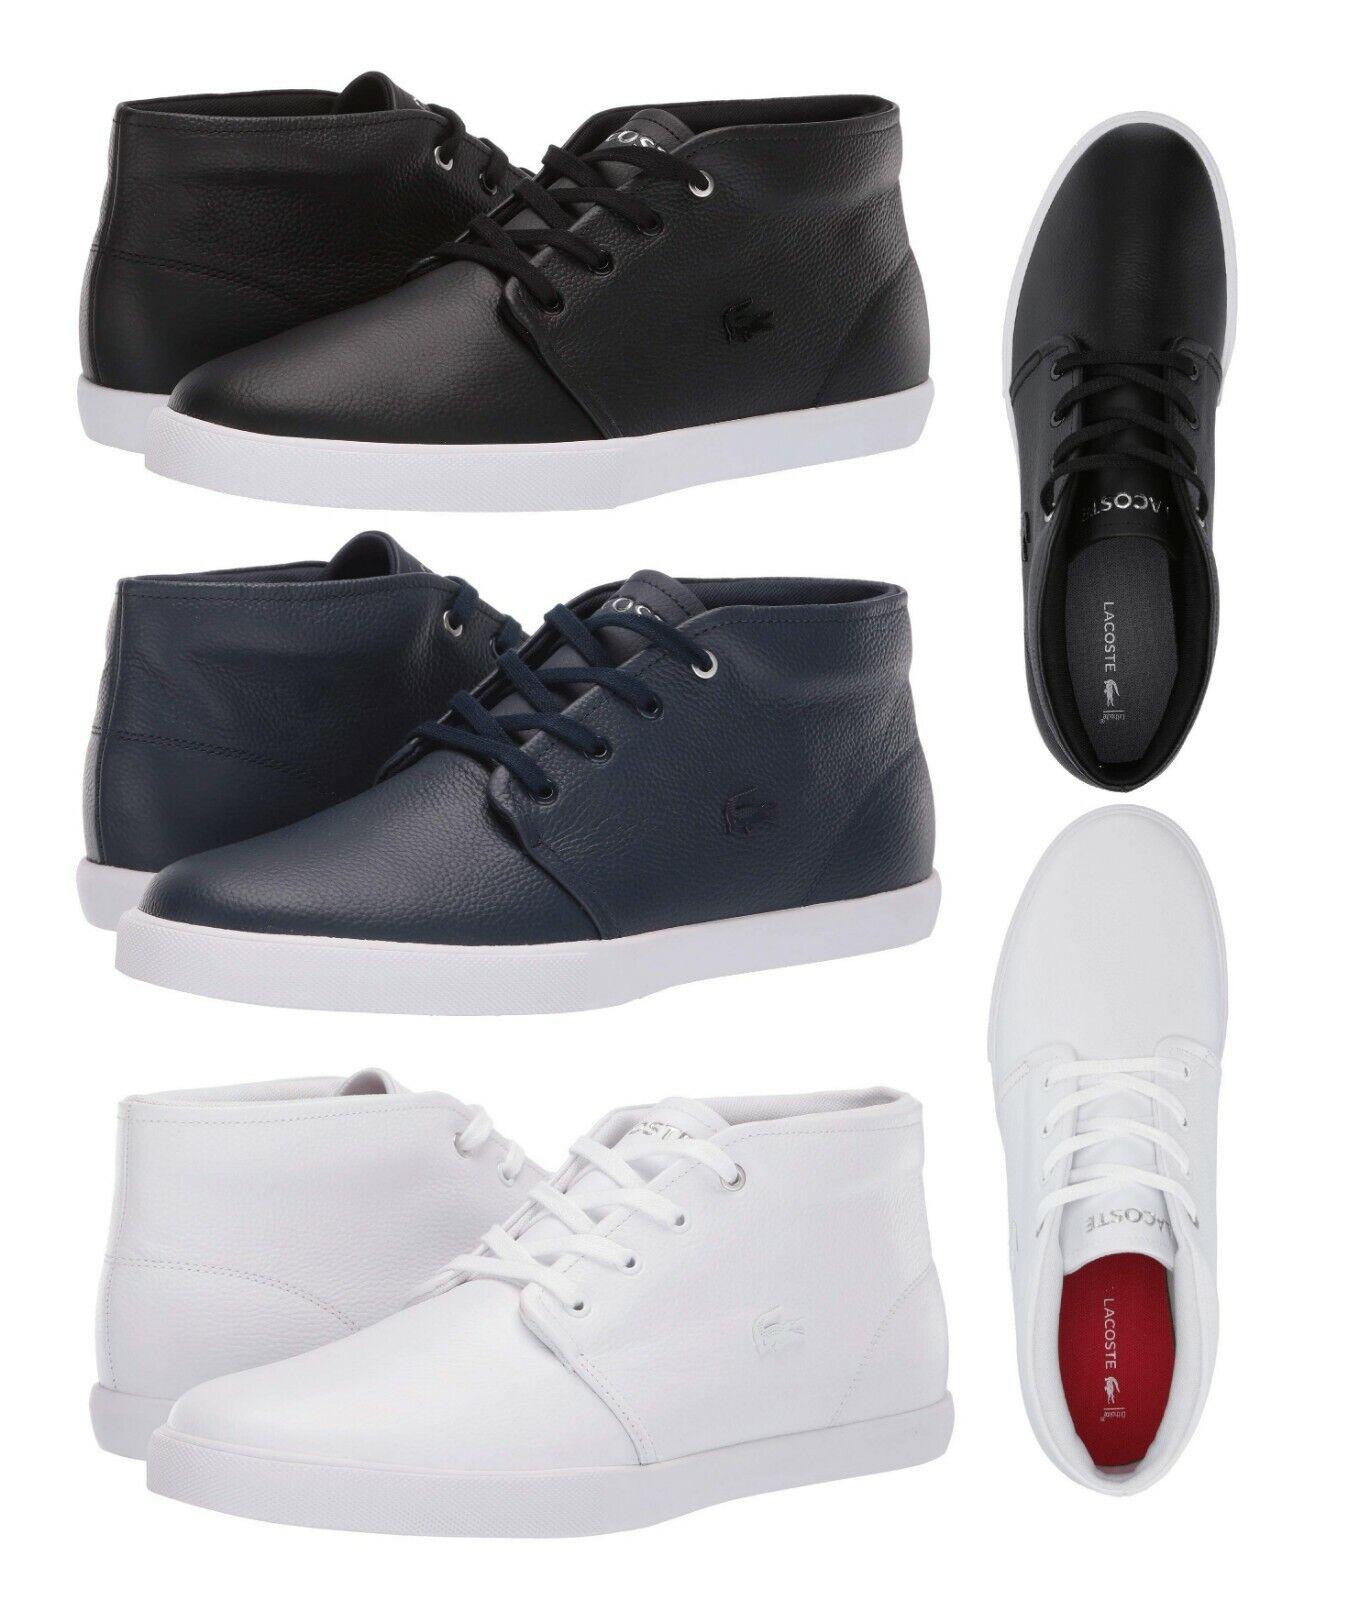 Lacoste Asparta 119 Men's Fashion High Top Croc Logo Leather Shoes Sneakers